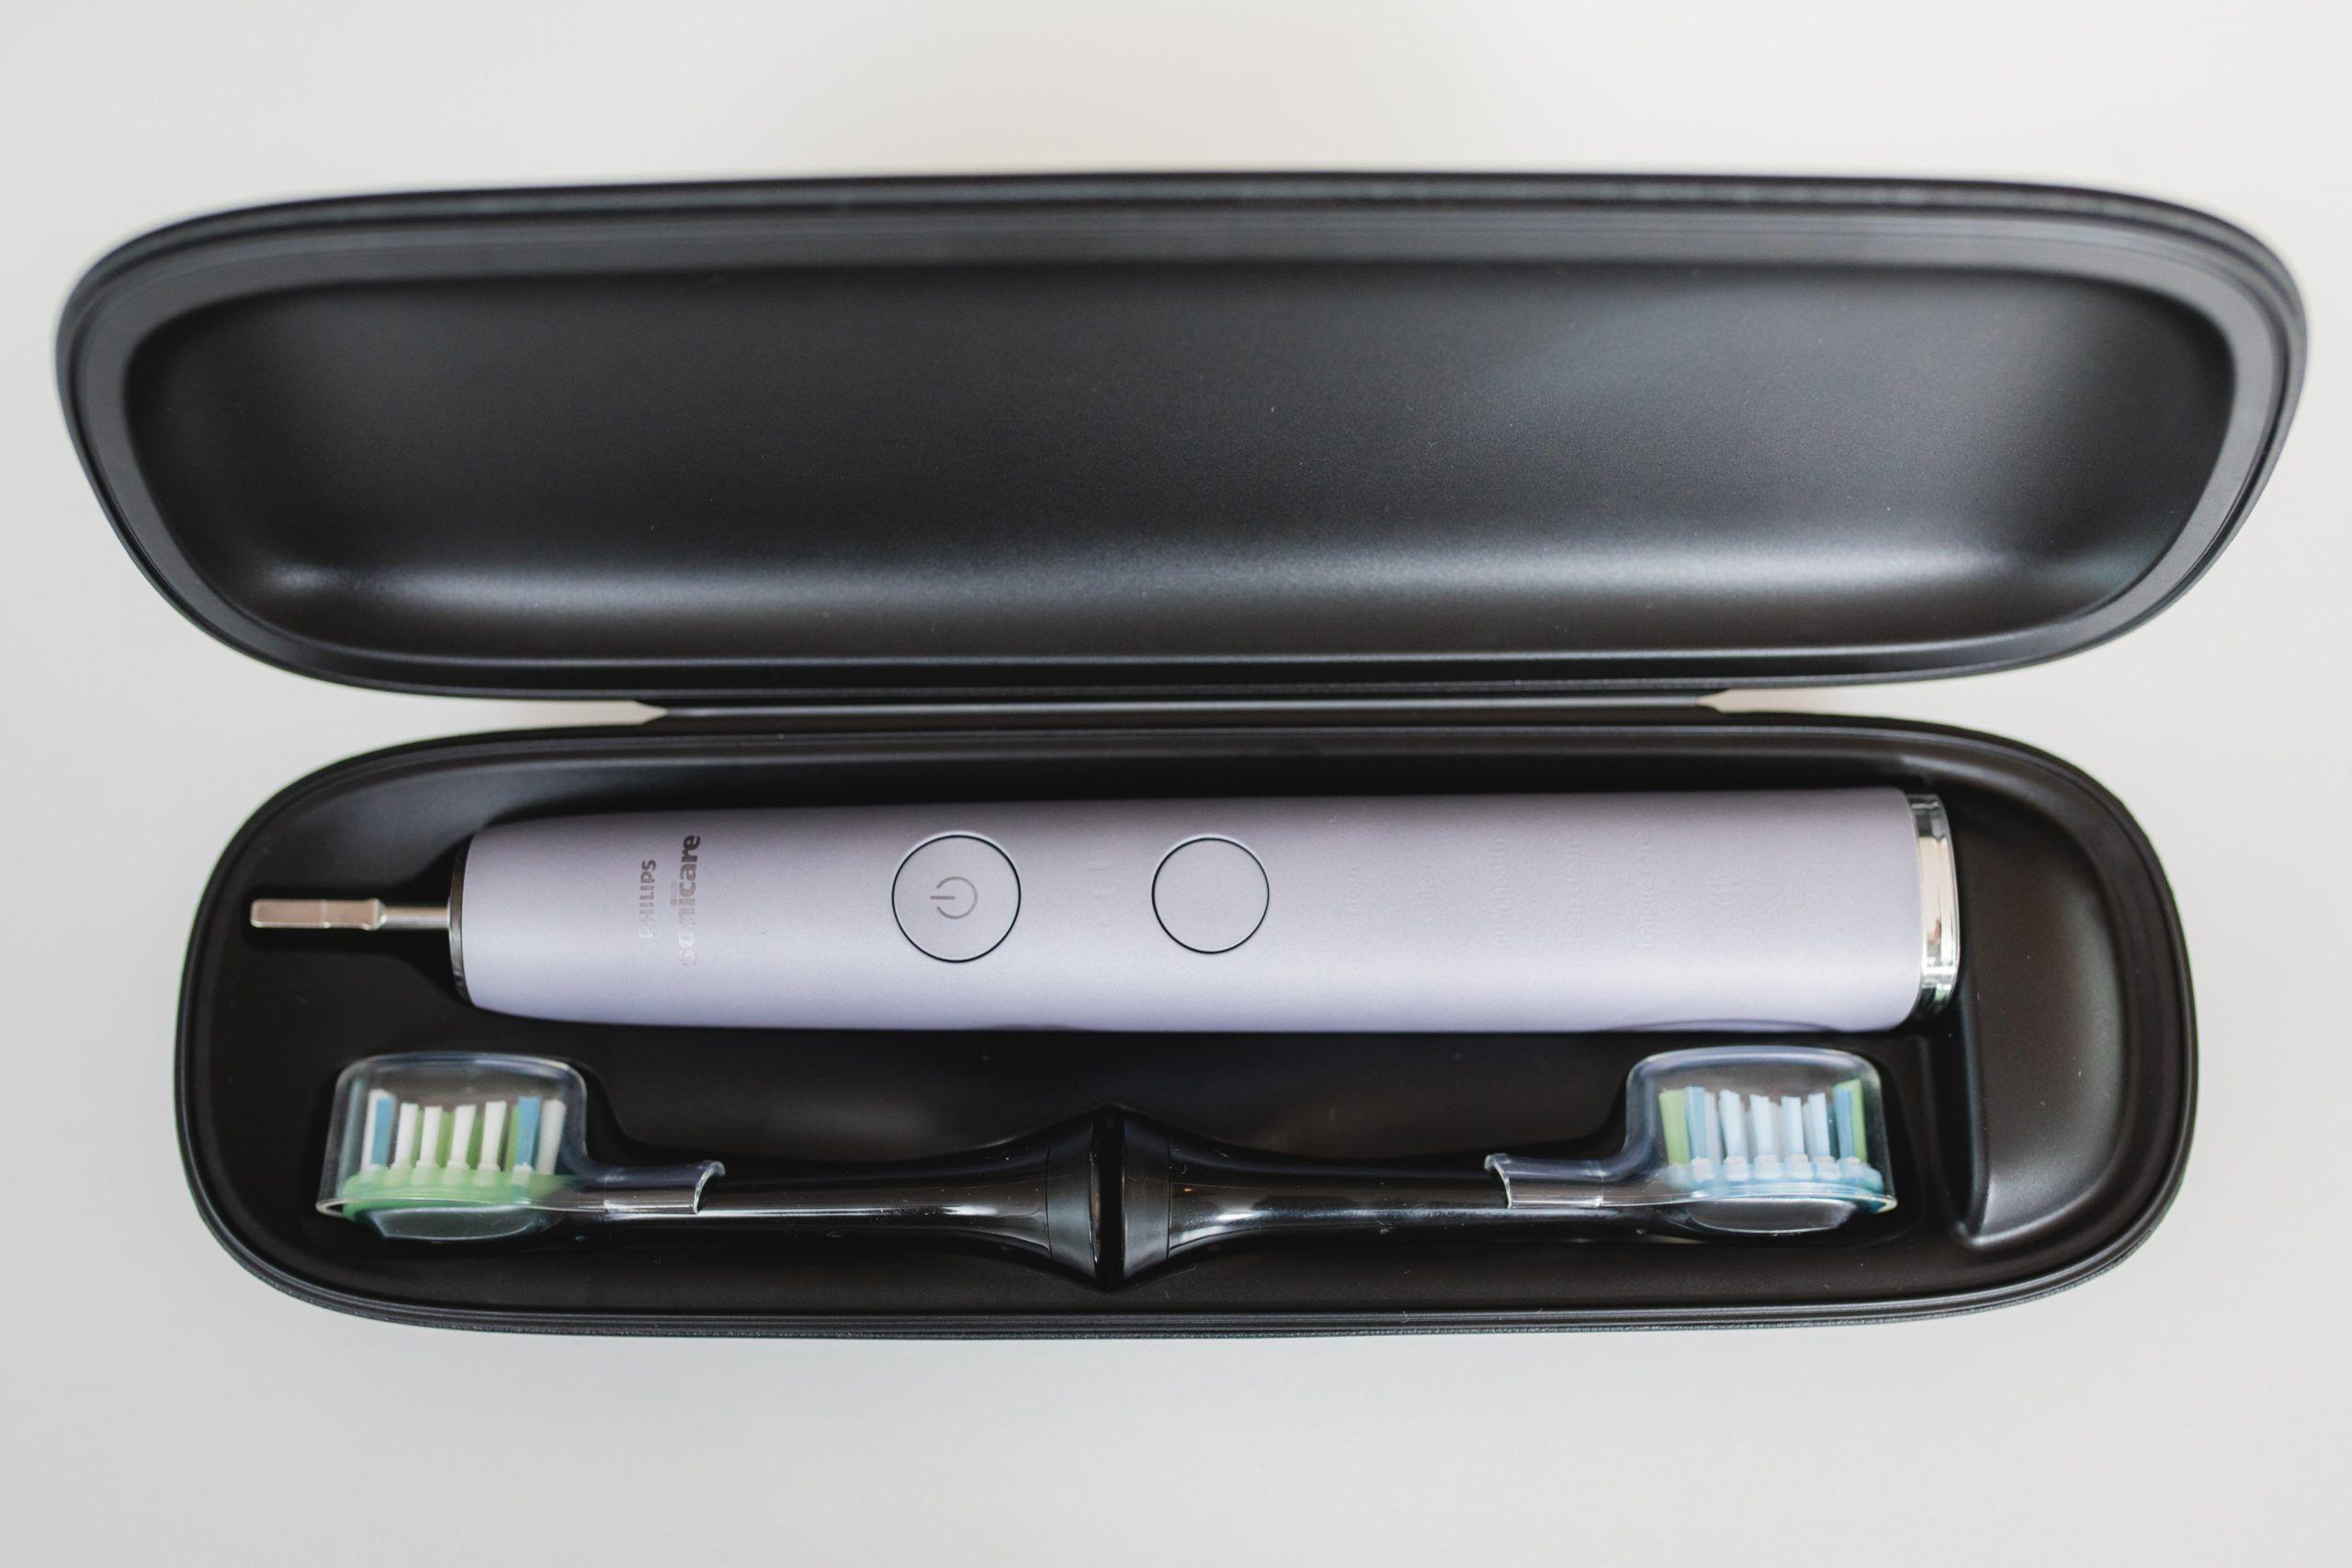 Eltandborste Philips Sonicare DiamondClean Smart i en låda